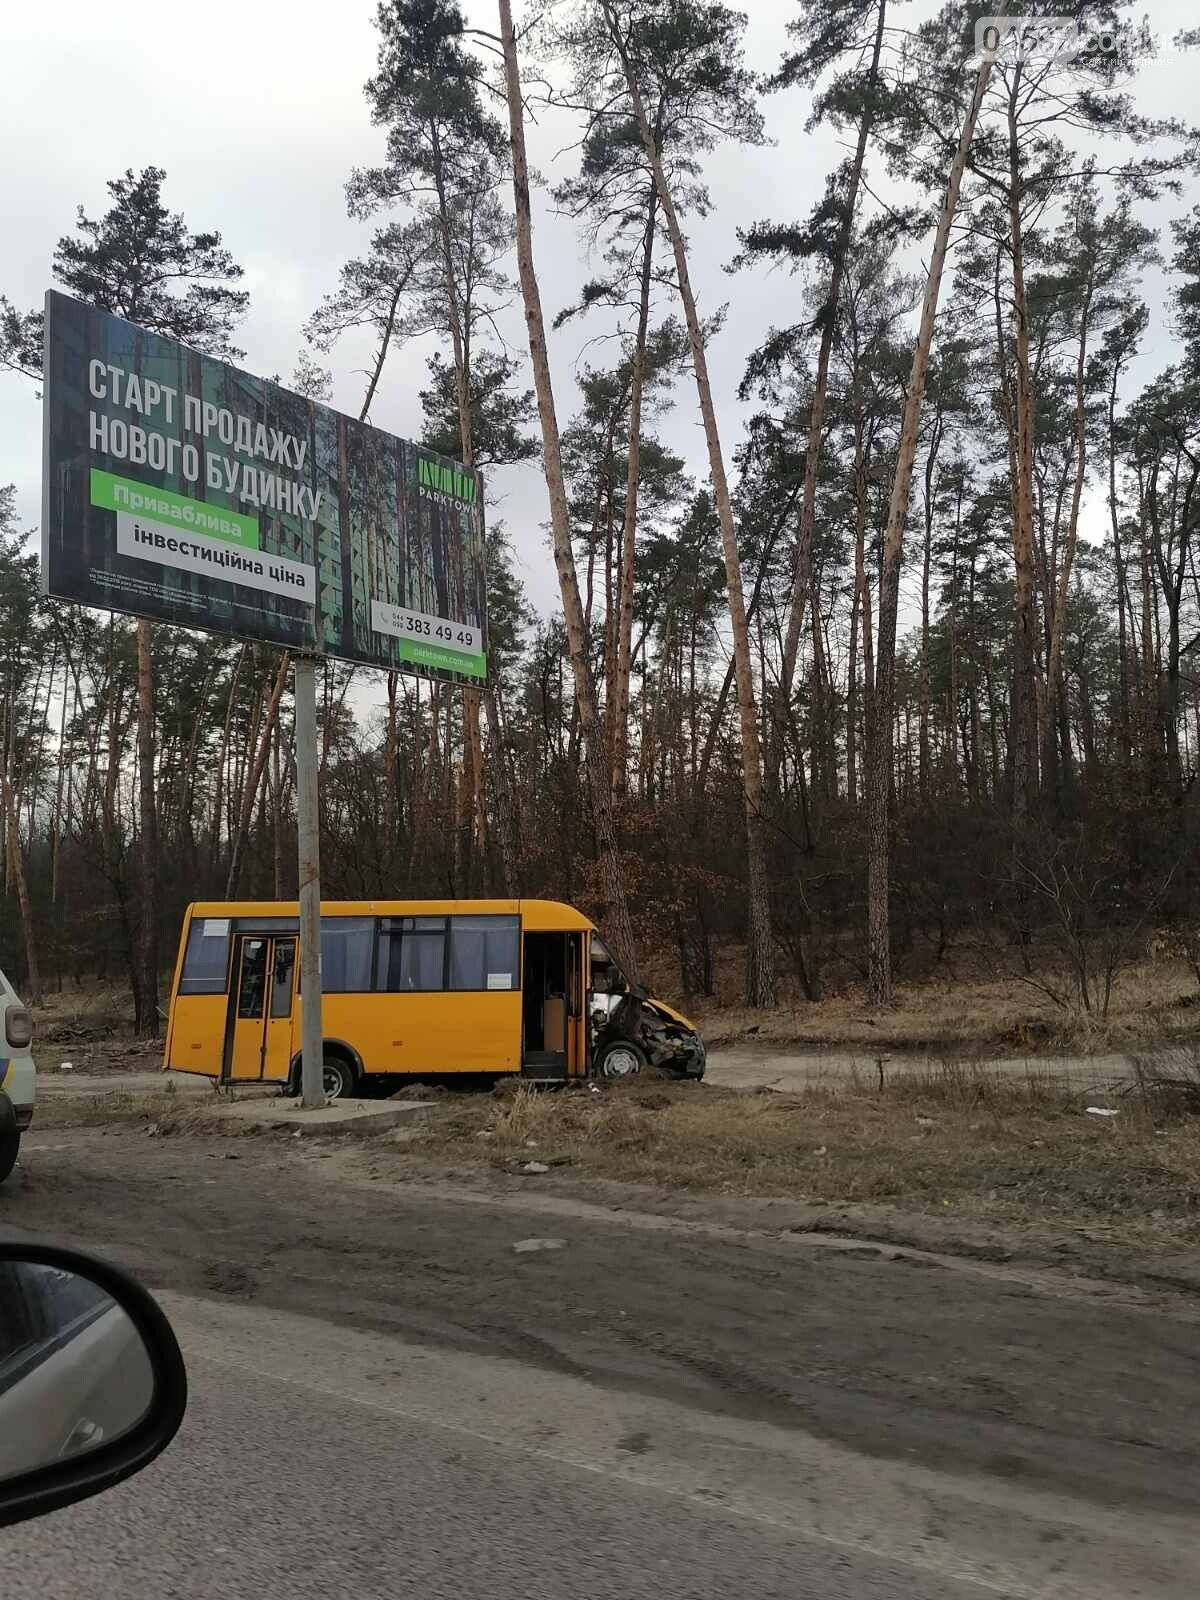 На Гостомельському шосе маршрутка потрапила в ДТП, Сайт Ірпеня